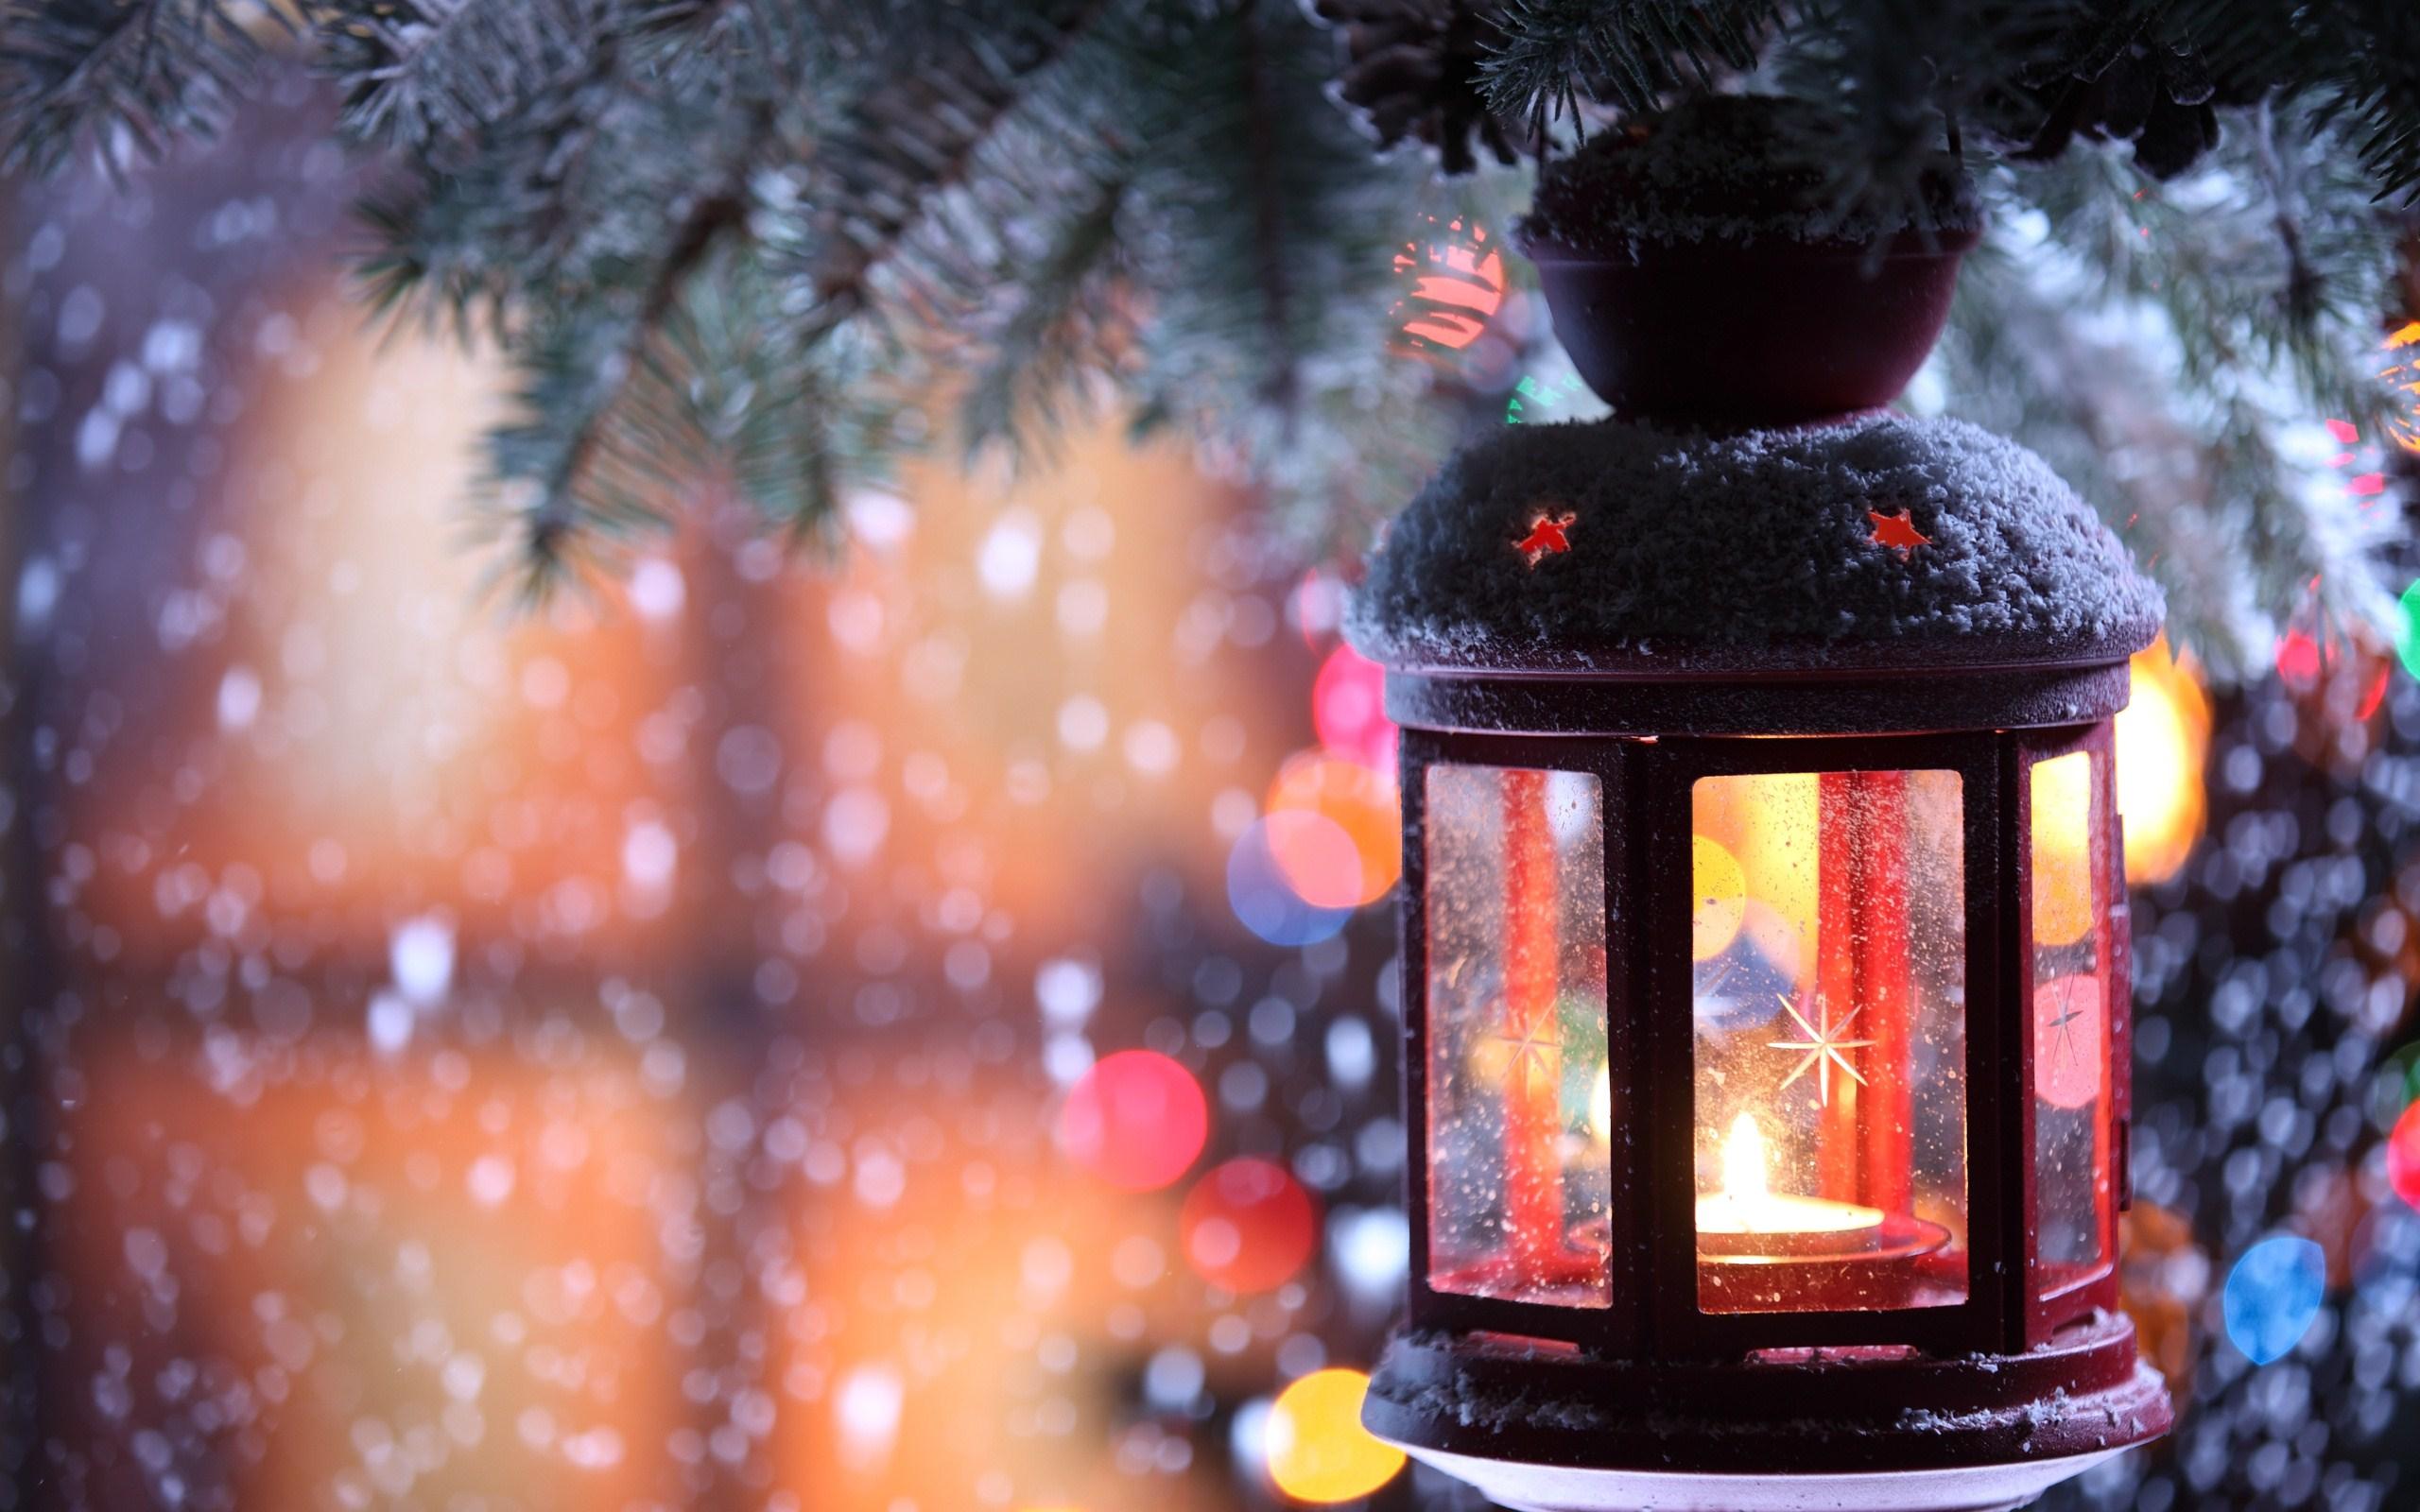 fir tree branch snow winter snowflakes christmas photo wallpaper 2560x1600